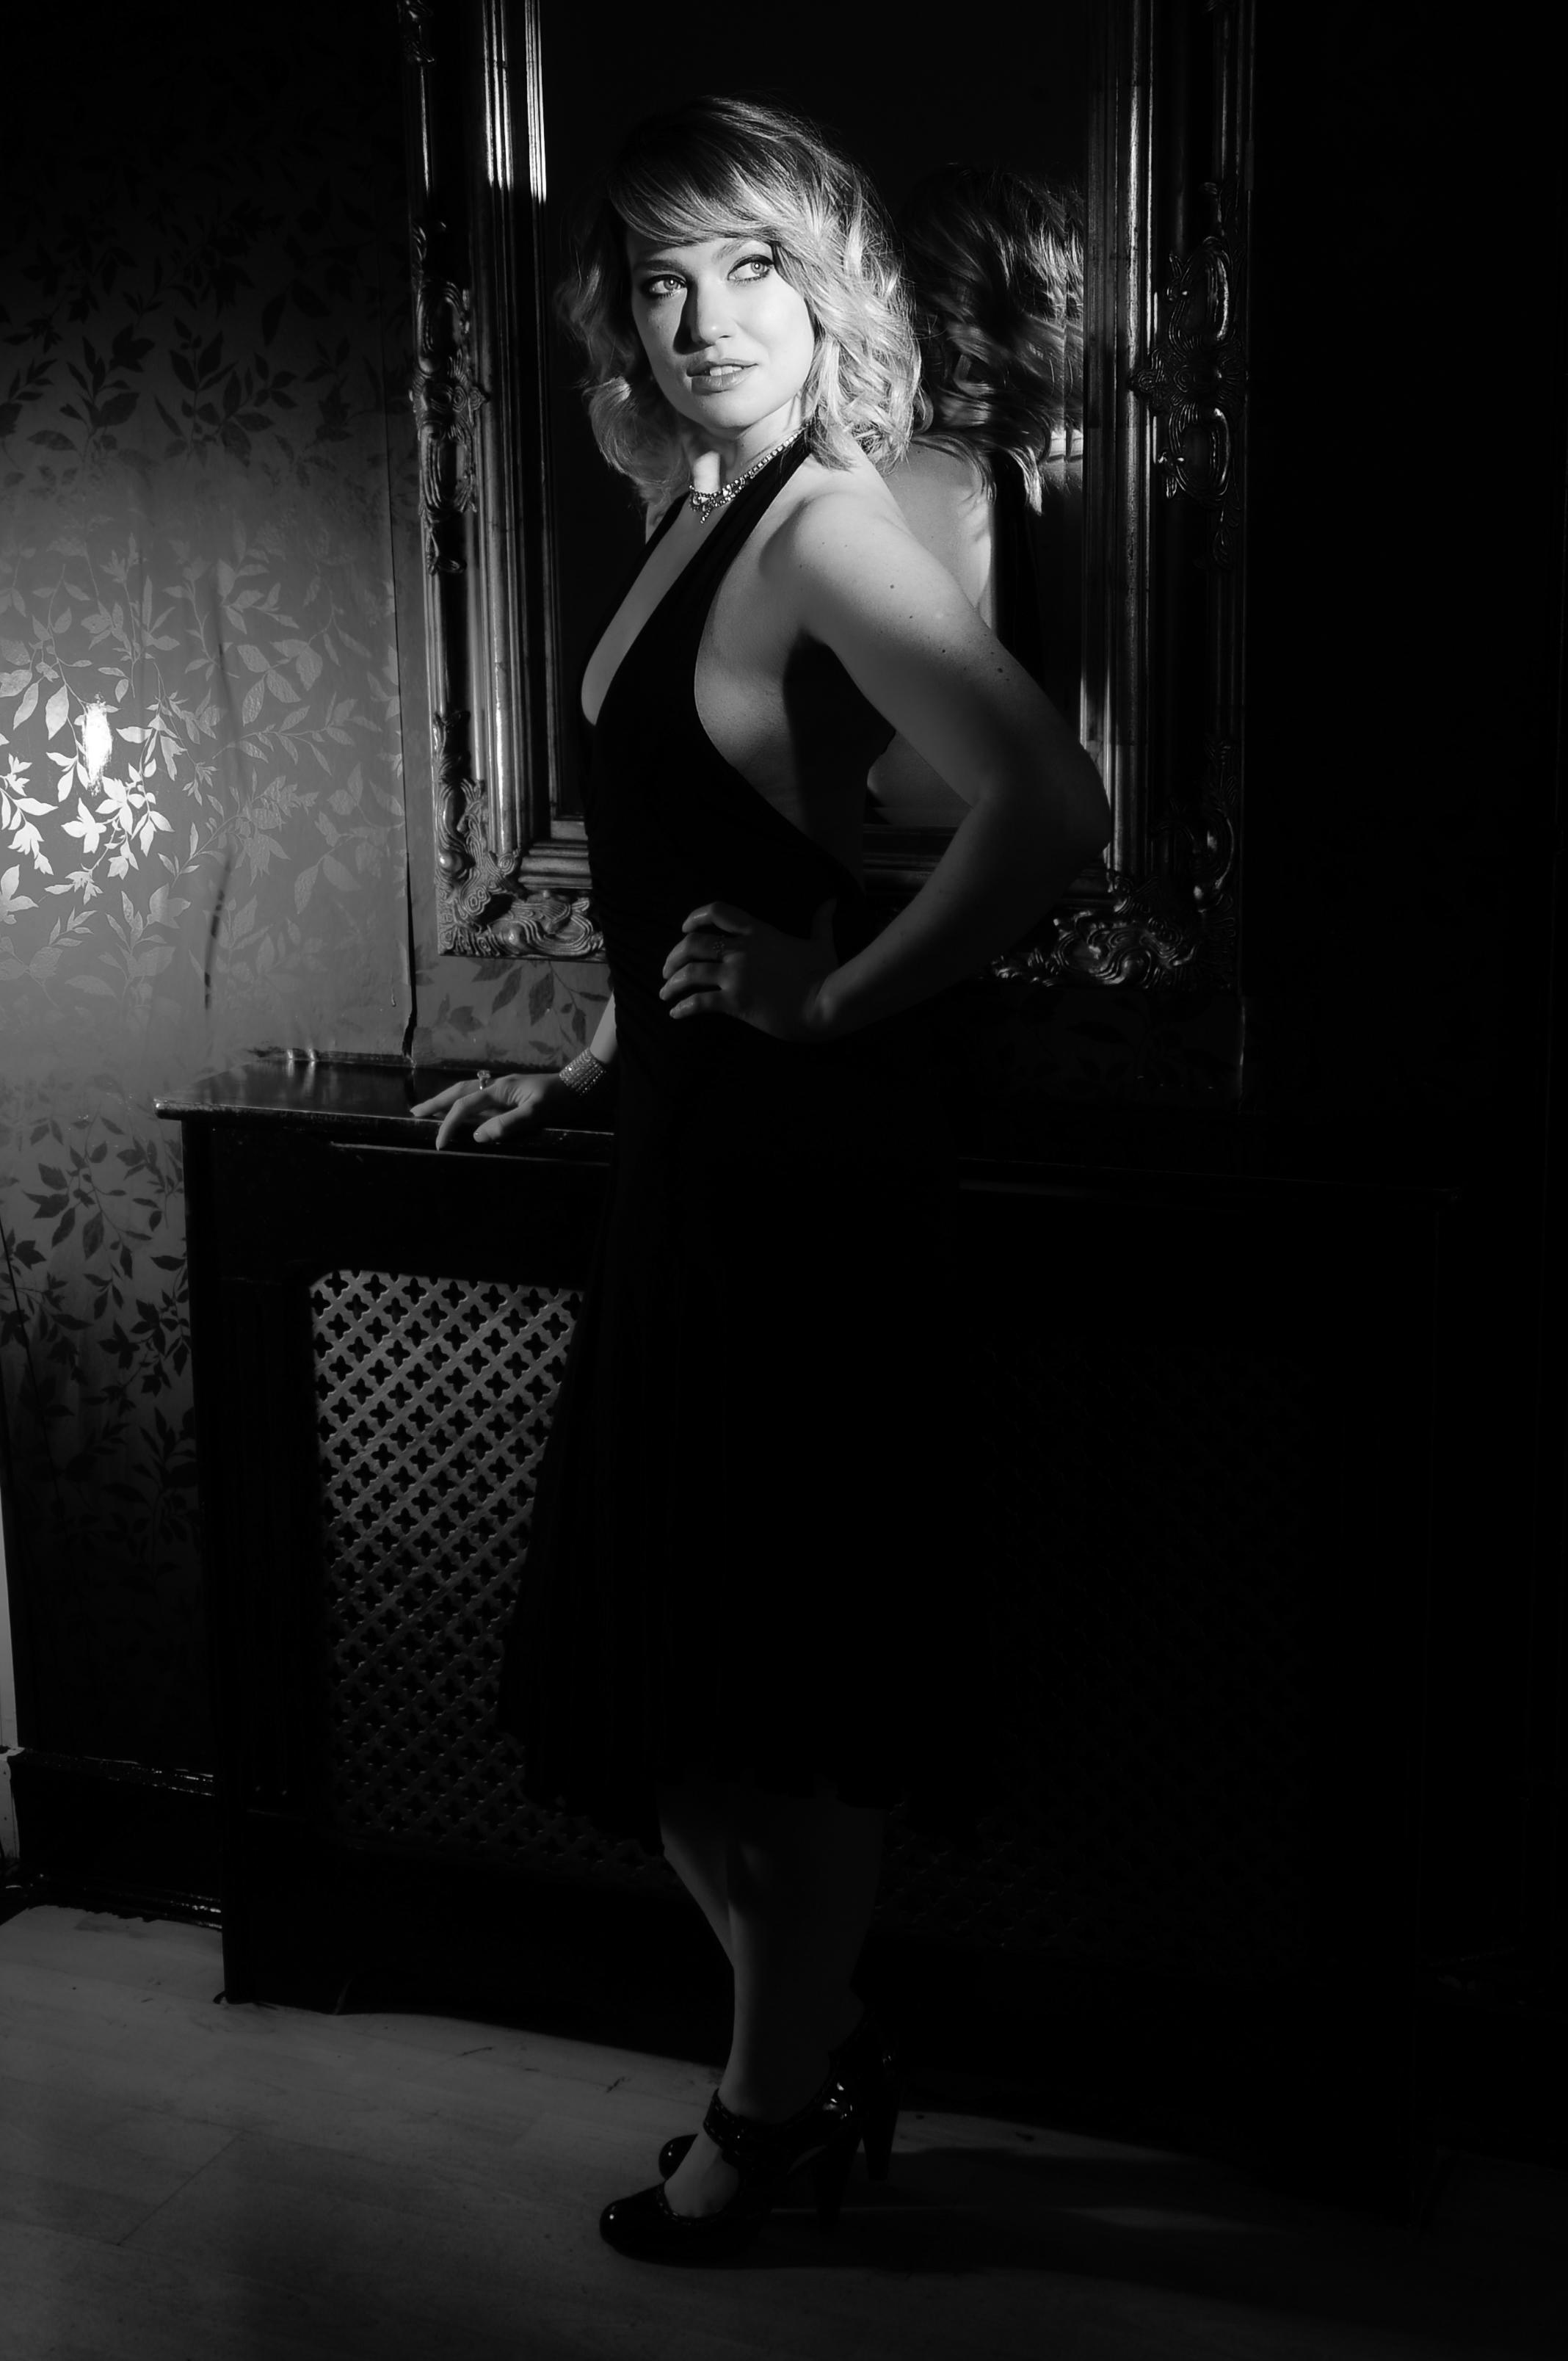 Promotional shot